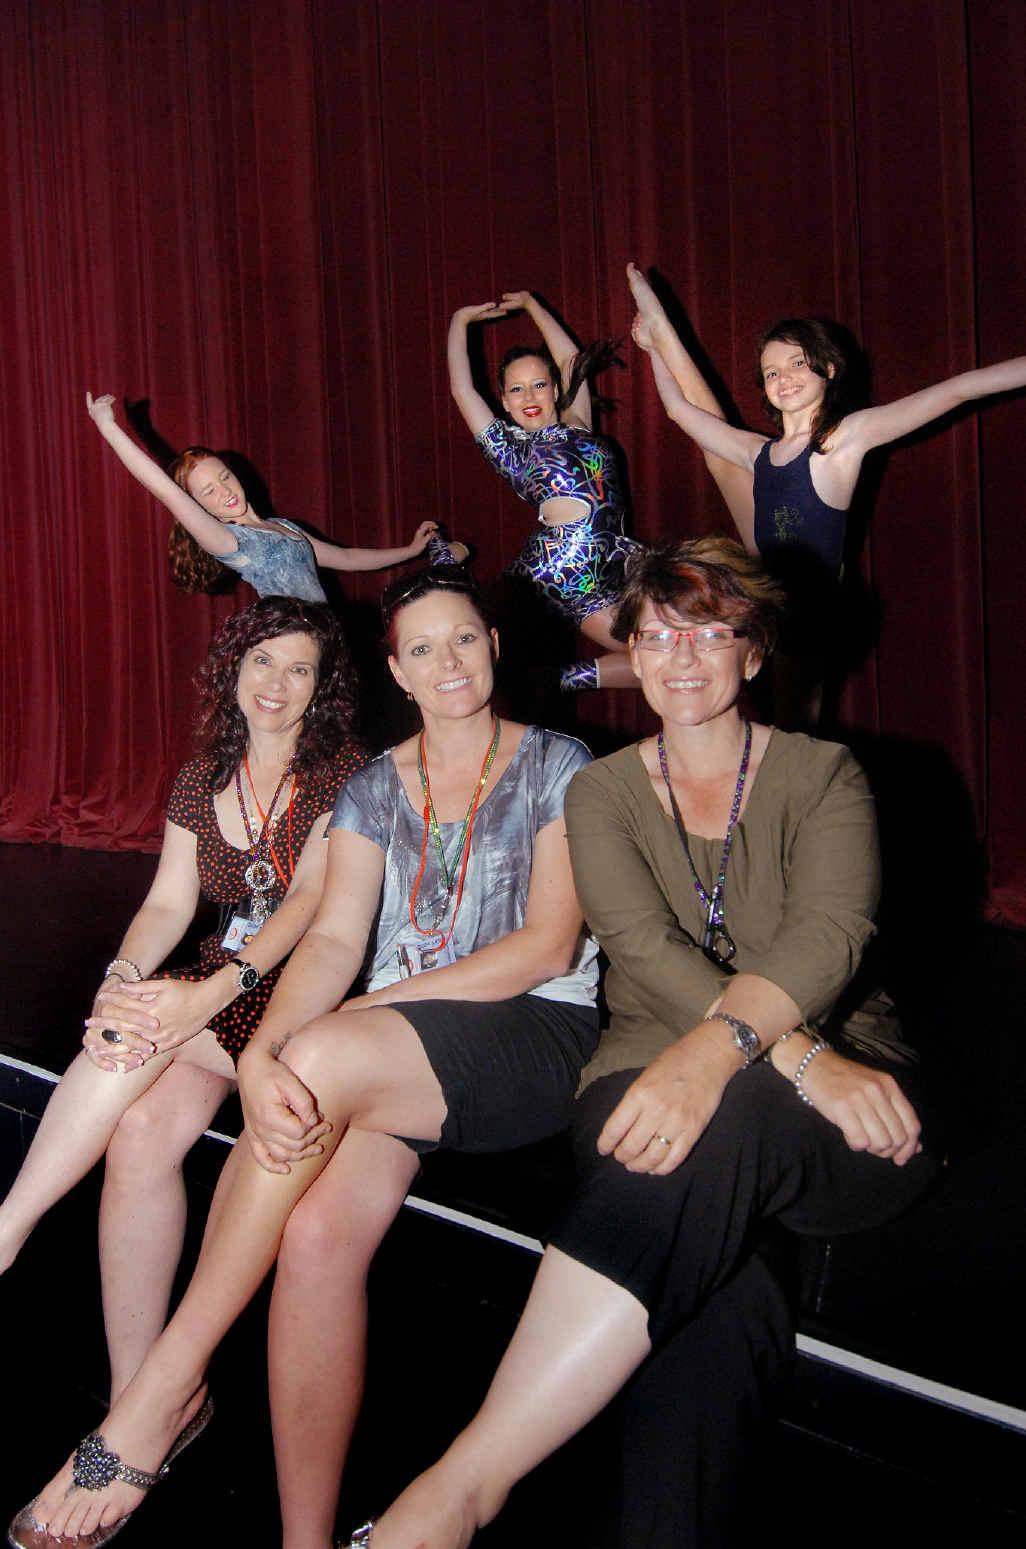 Lesa Walker, Cindy Hayes and Rebecca Marsh and daughters Taylor Hayes, Ebony Walker and Peita Marsh.